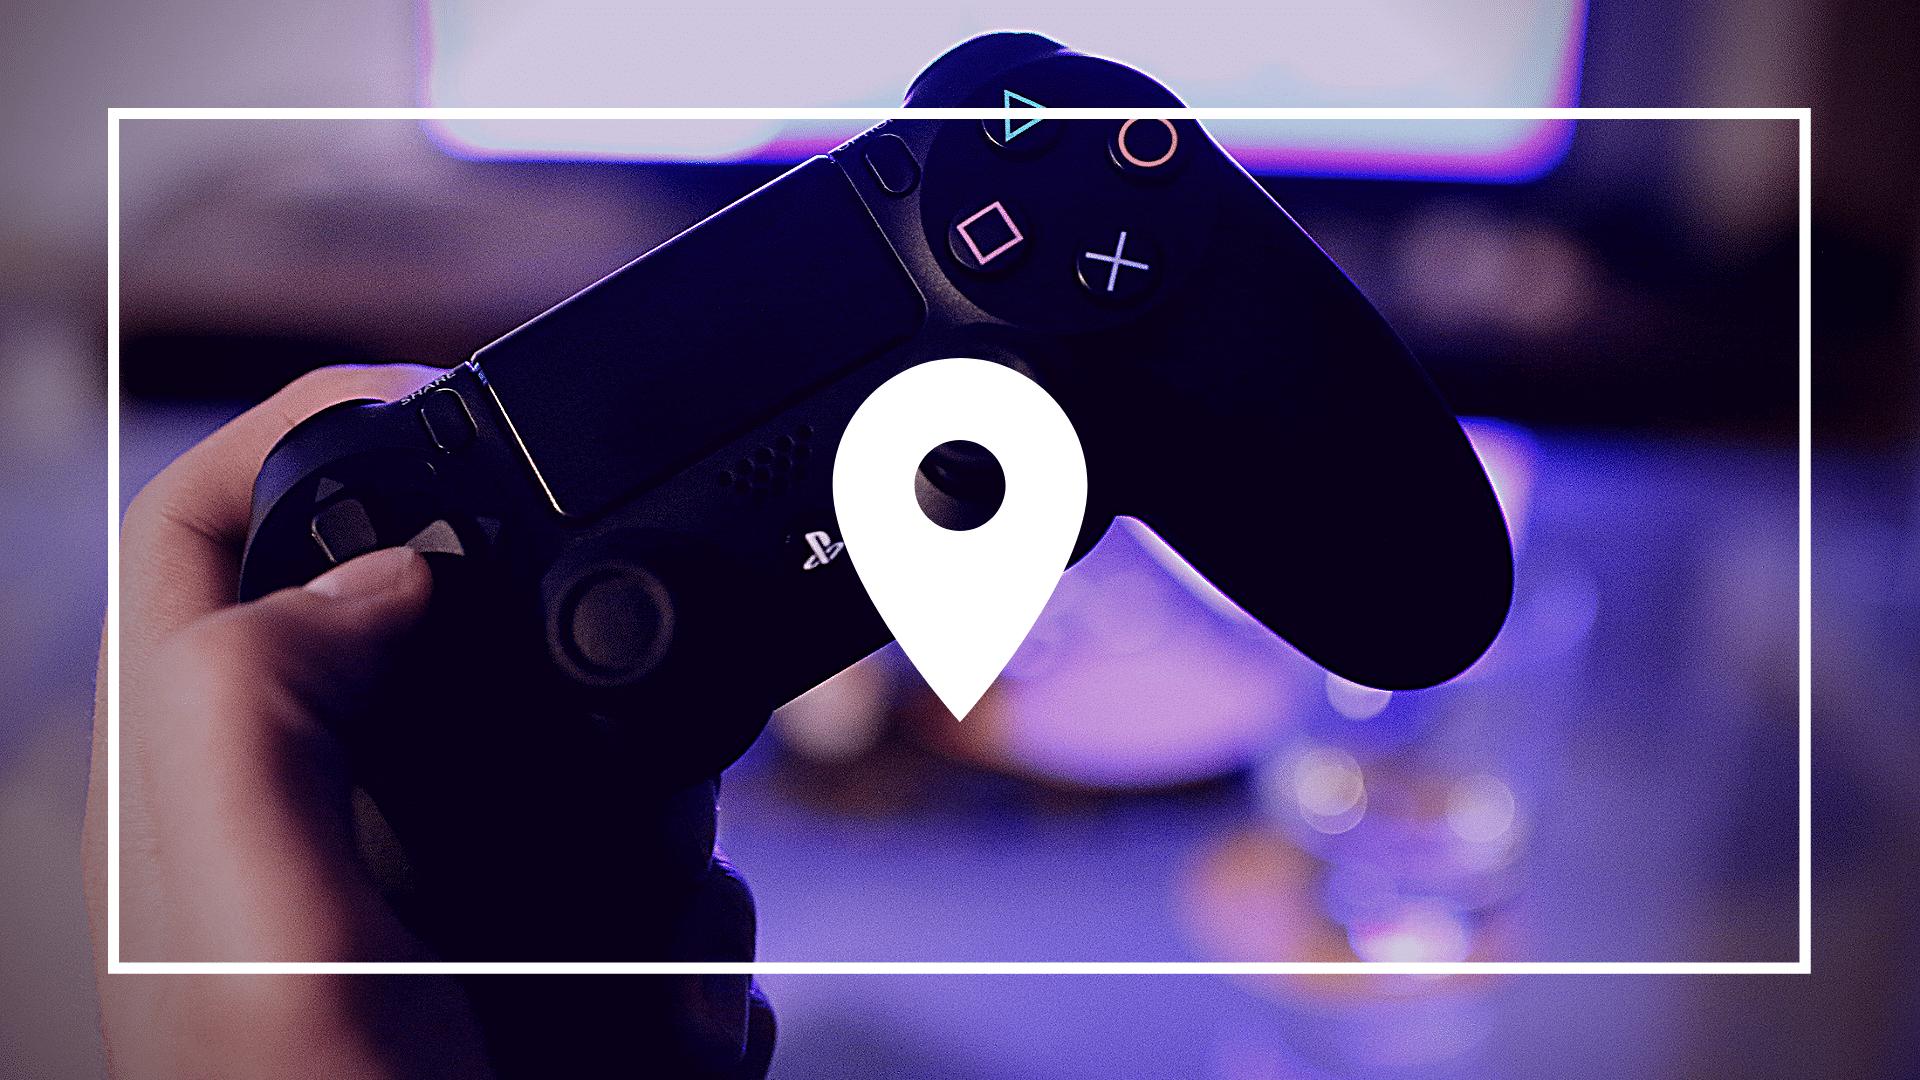 localization-icon-videogame-background